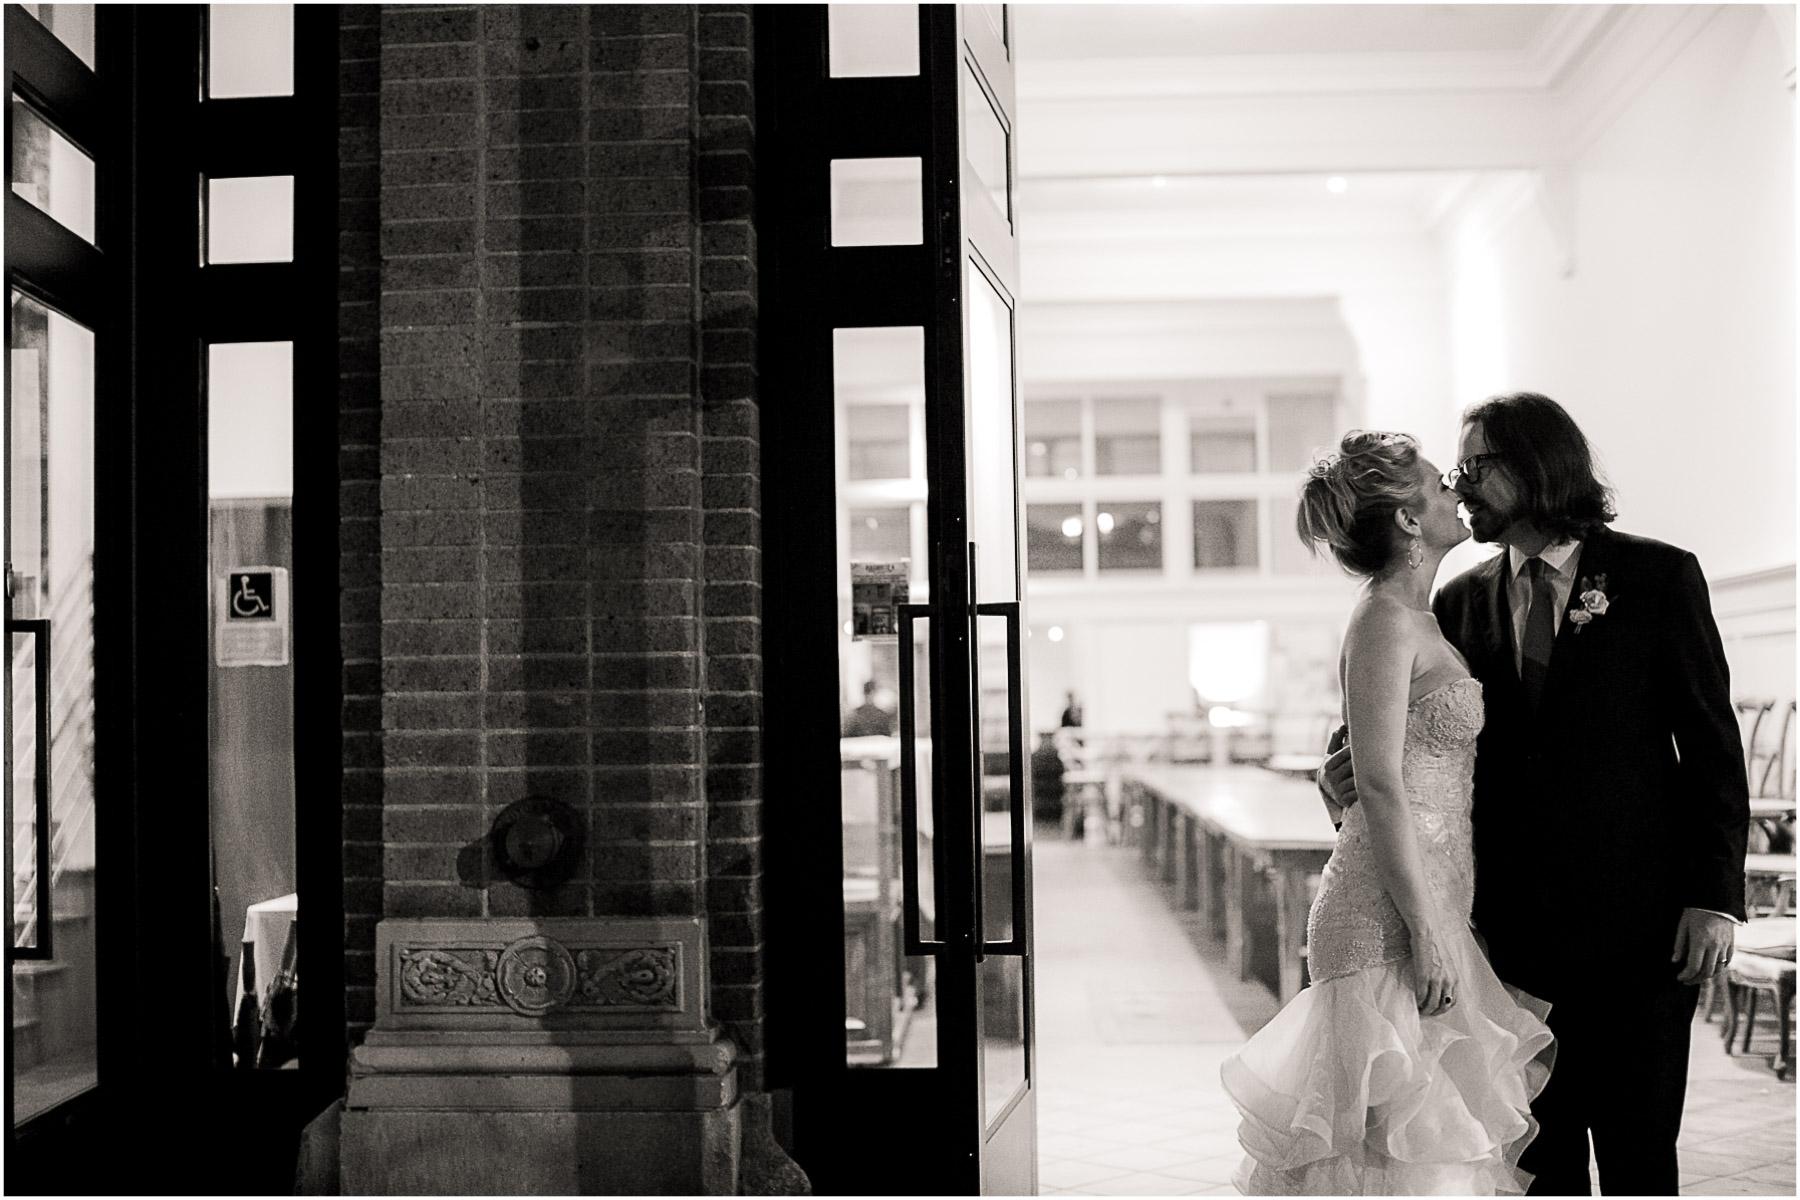 JennaBethPhotography-LEWedding-28.jpg